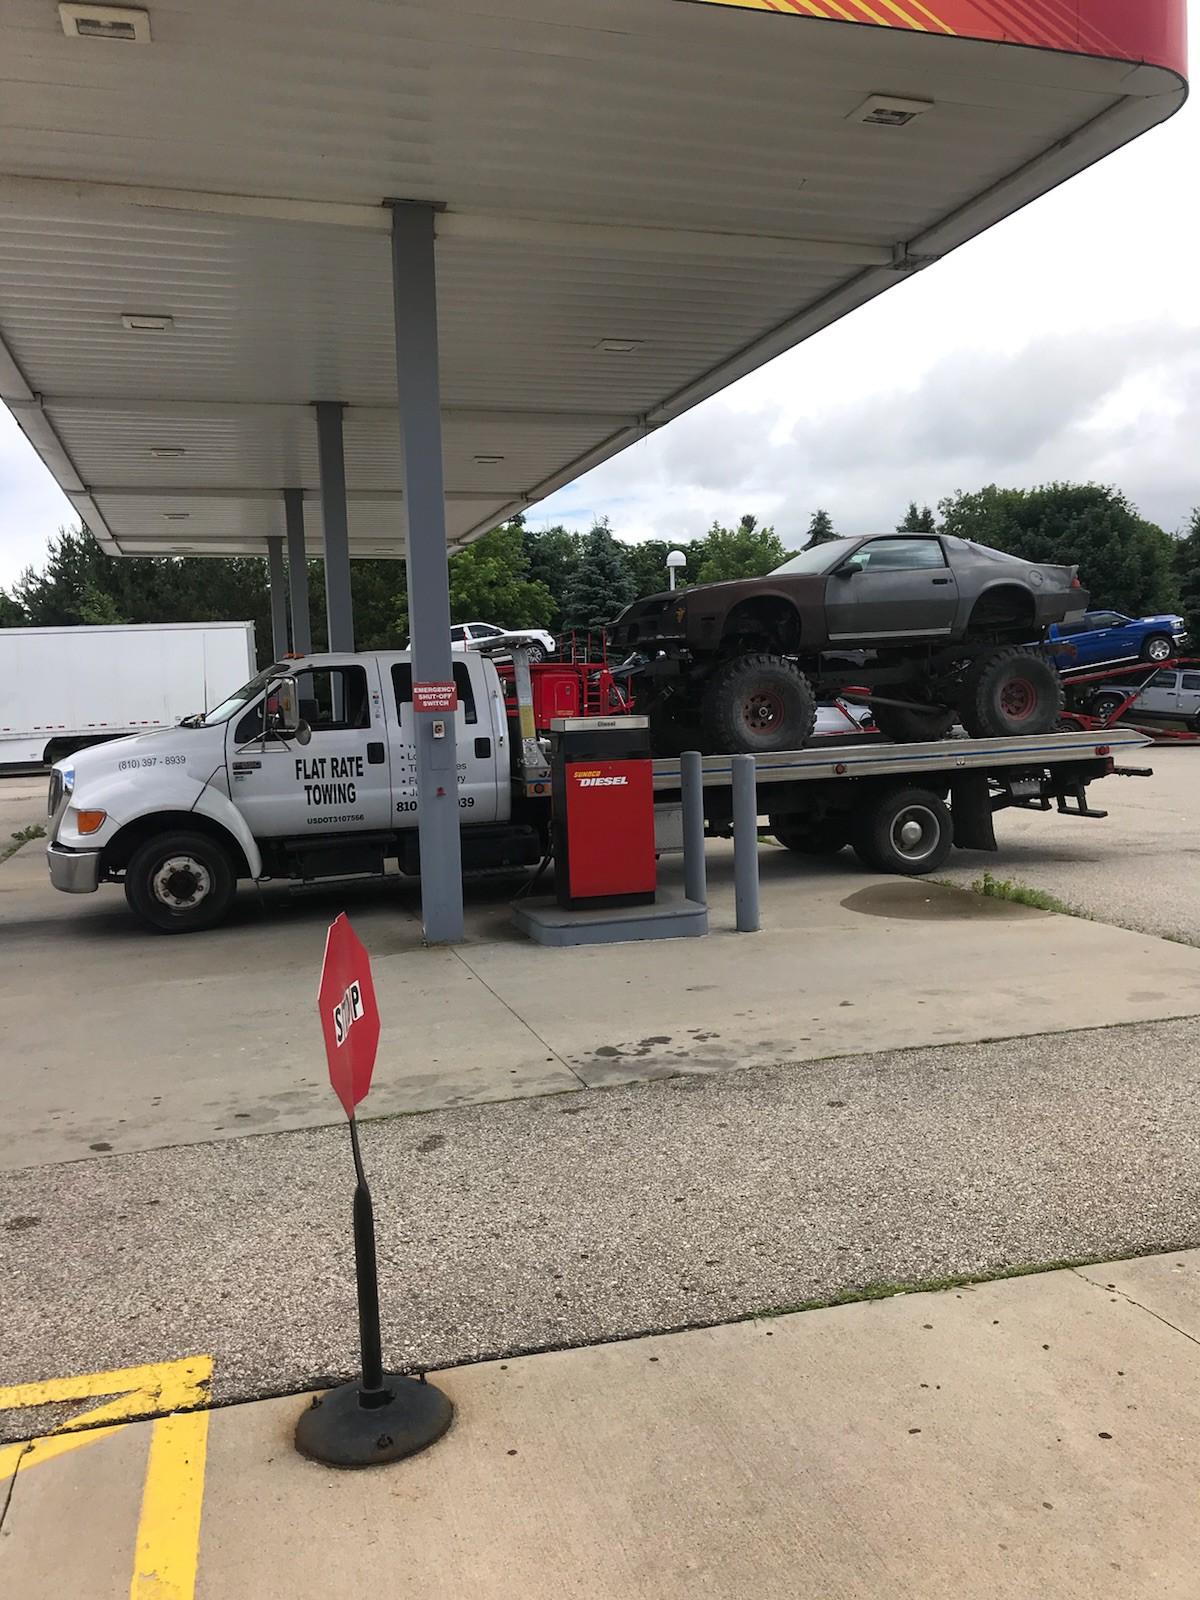 Tire Repair Near Me Open Sunday >> Flat Rate Towing & Service, Flint Michigan (MI ...